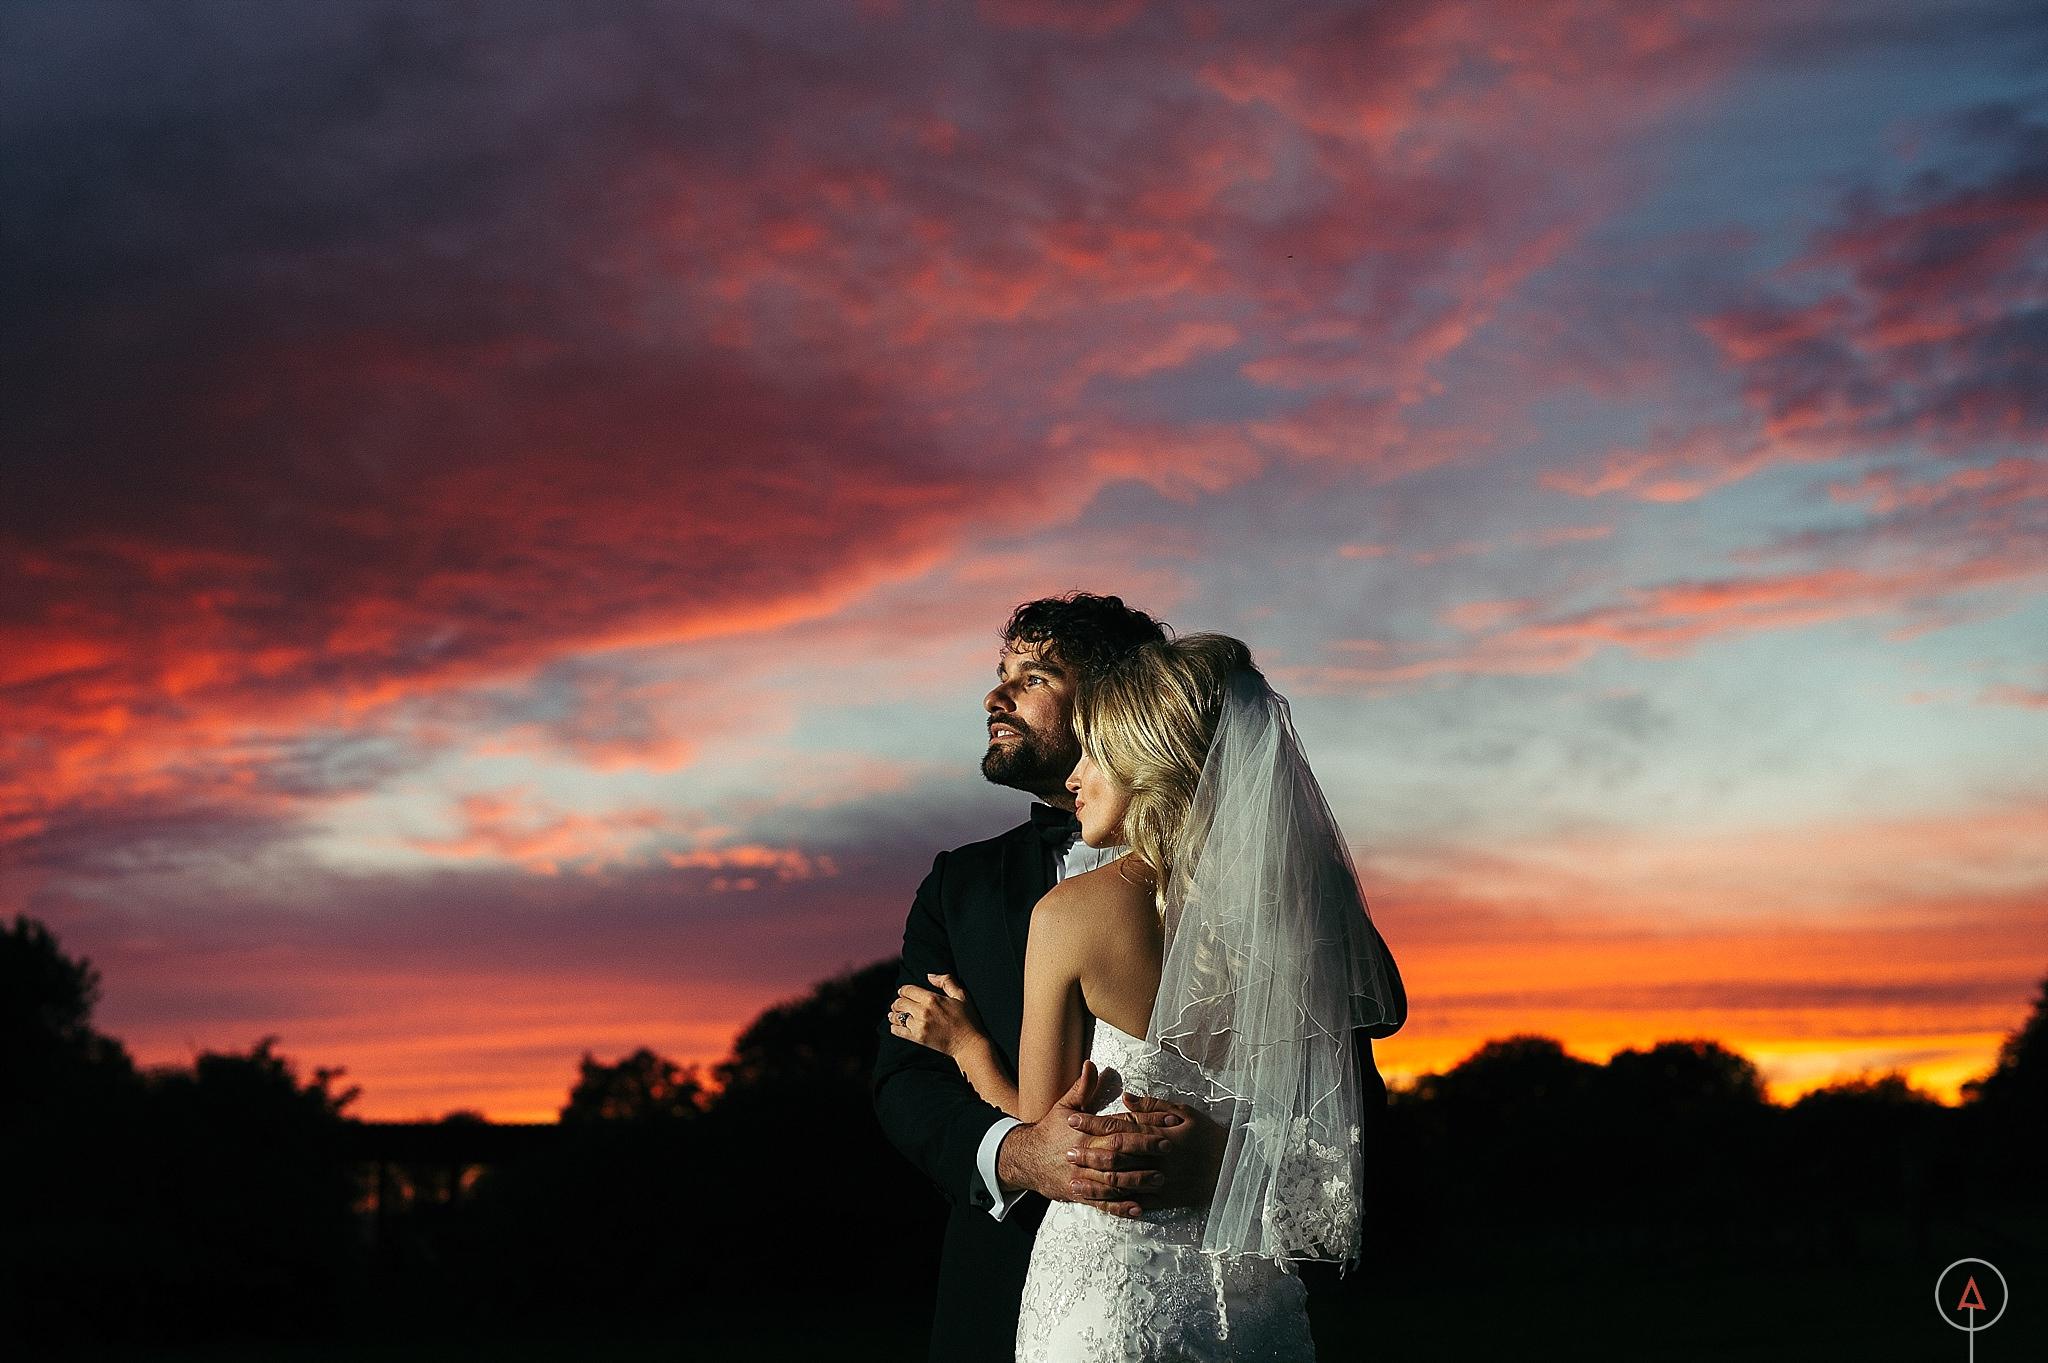 cardiff-wedding-photographer-aga-tomaszek_0417